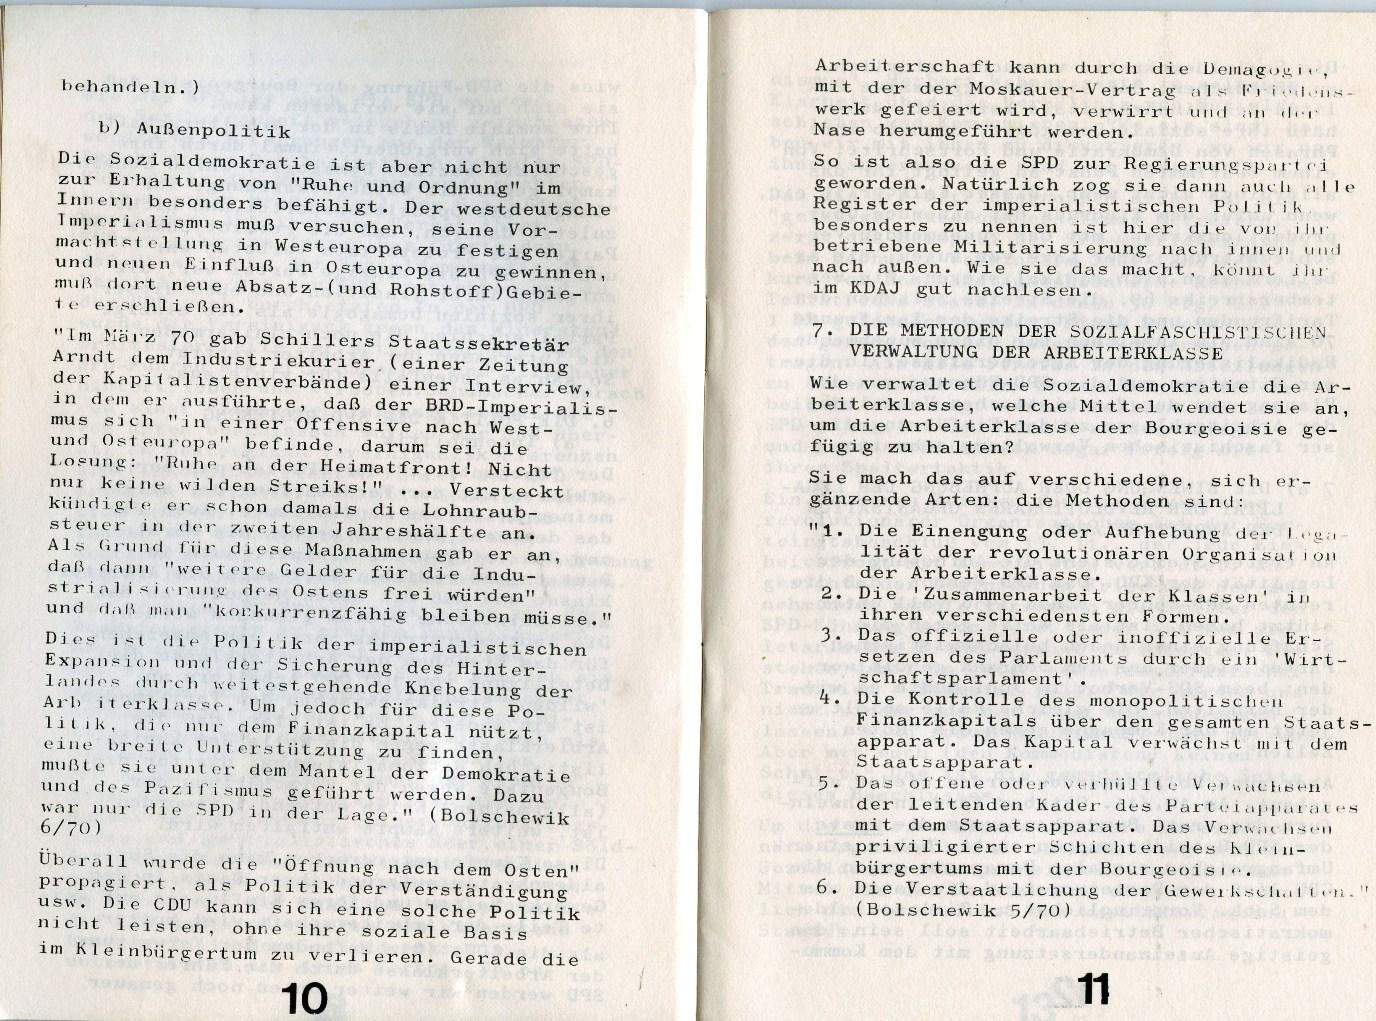 KJVD_Sozialdemokratie_Sozialfaschismus_1971_07